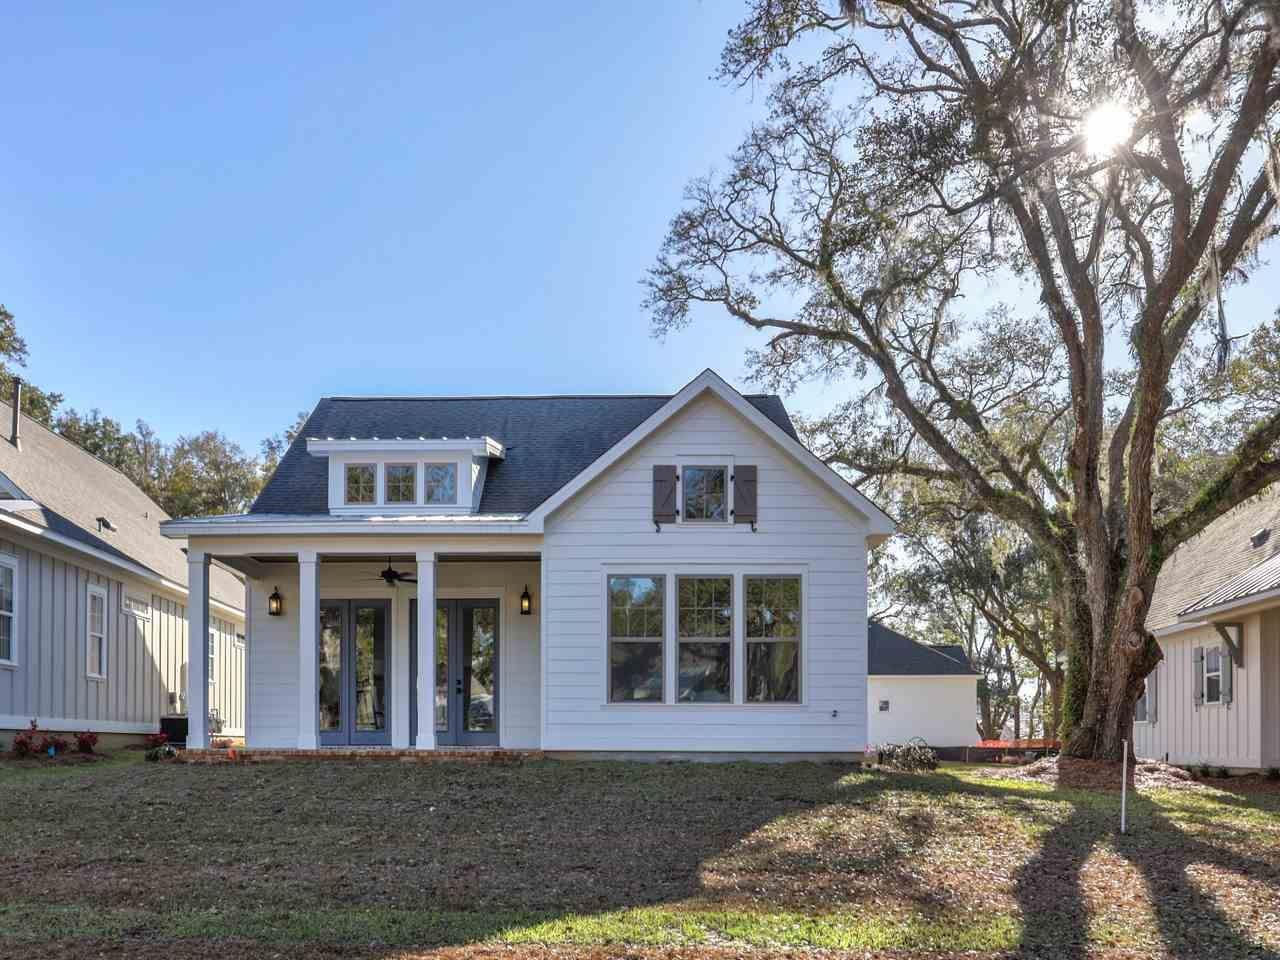 233 Camellia Oaks Avenue, Tallahassee, FL 32308 - MLS#: 317358